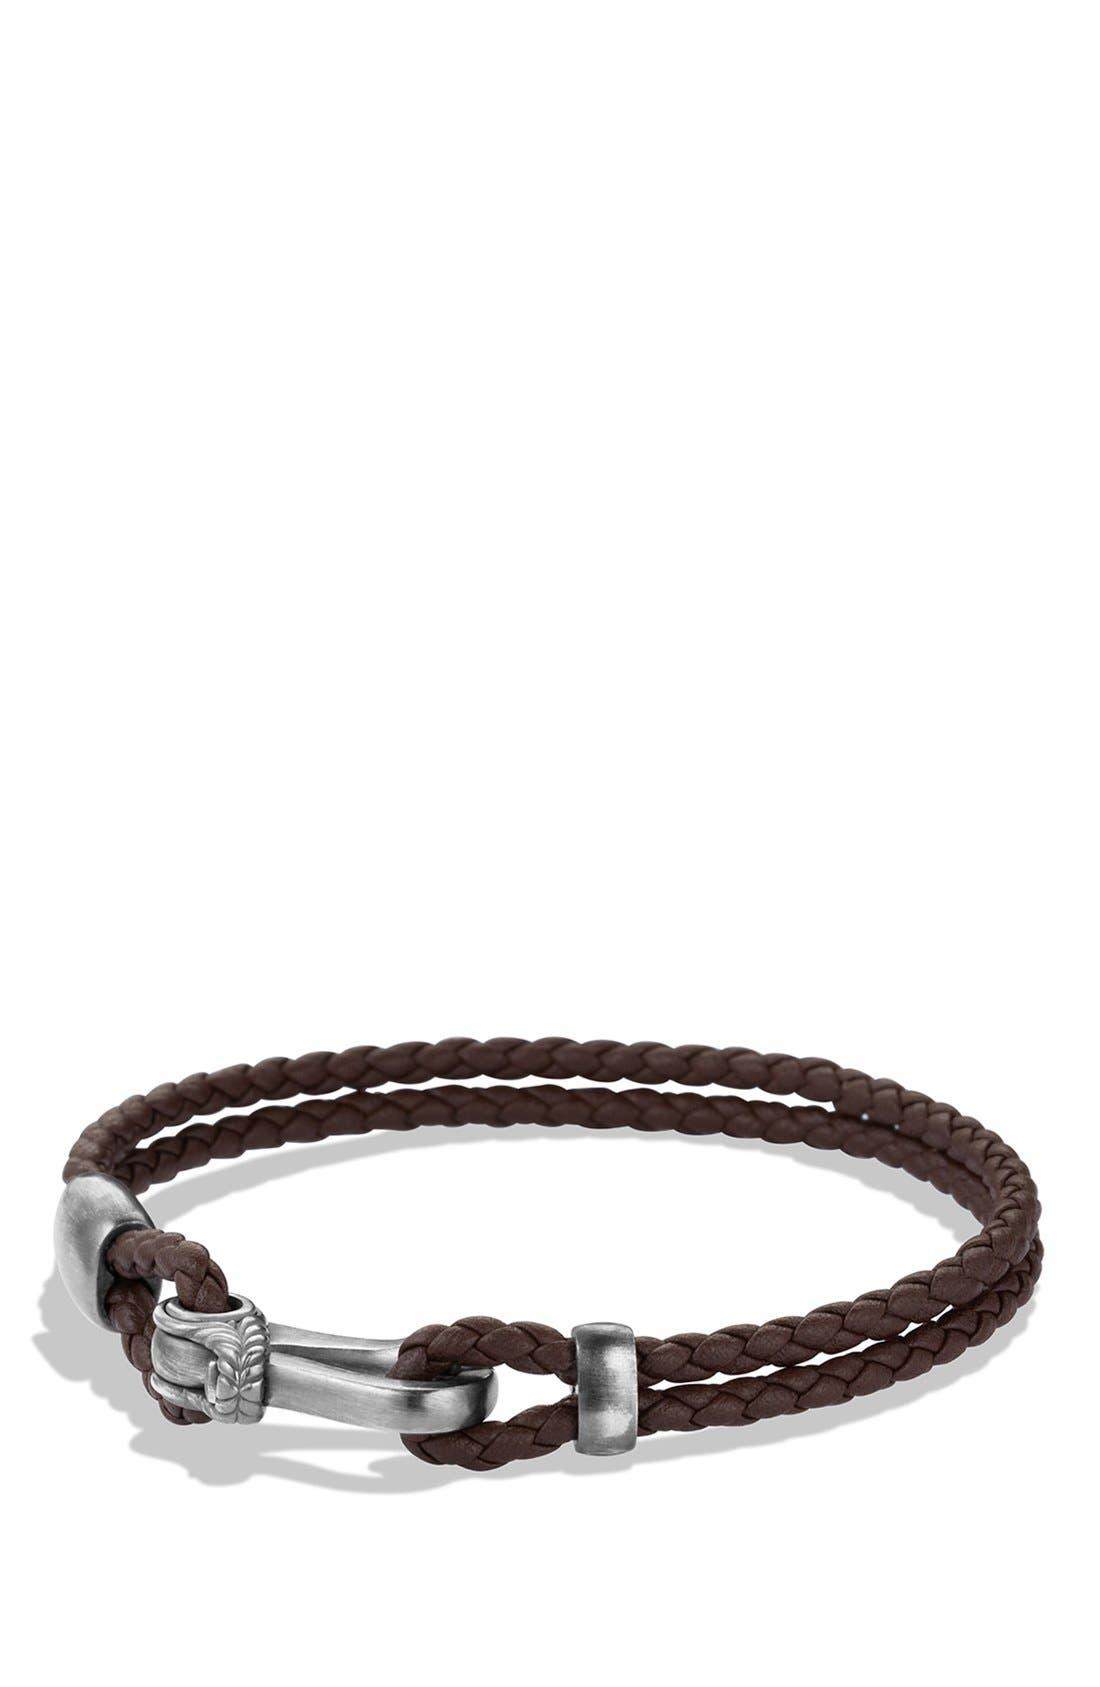 Alternate Image 1 Selected - David Yurman 'Maritime' Anchor Two-Row Bracelet